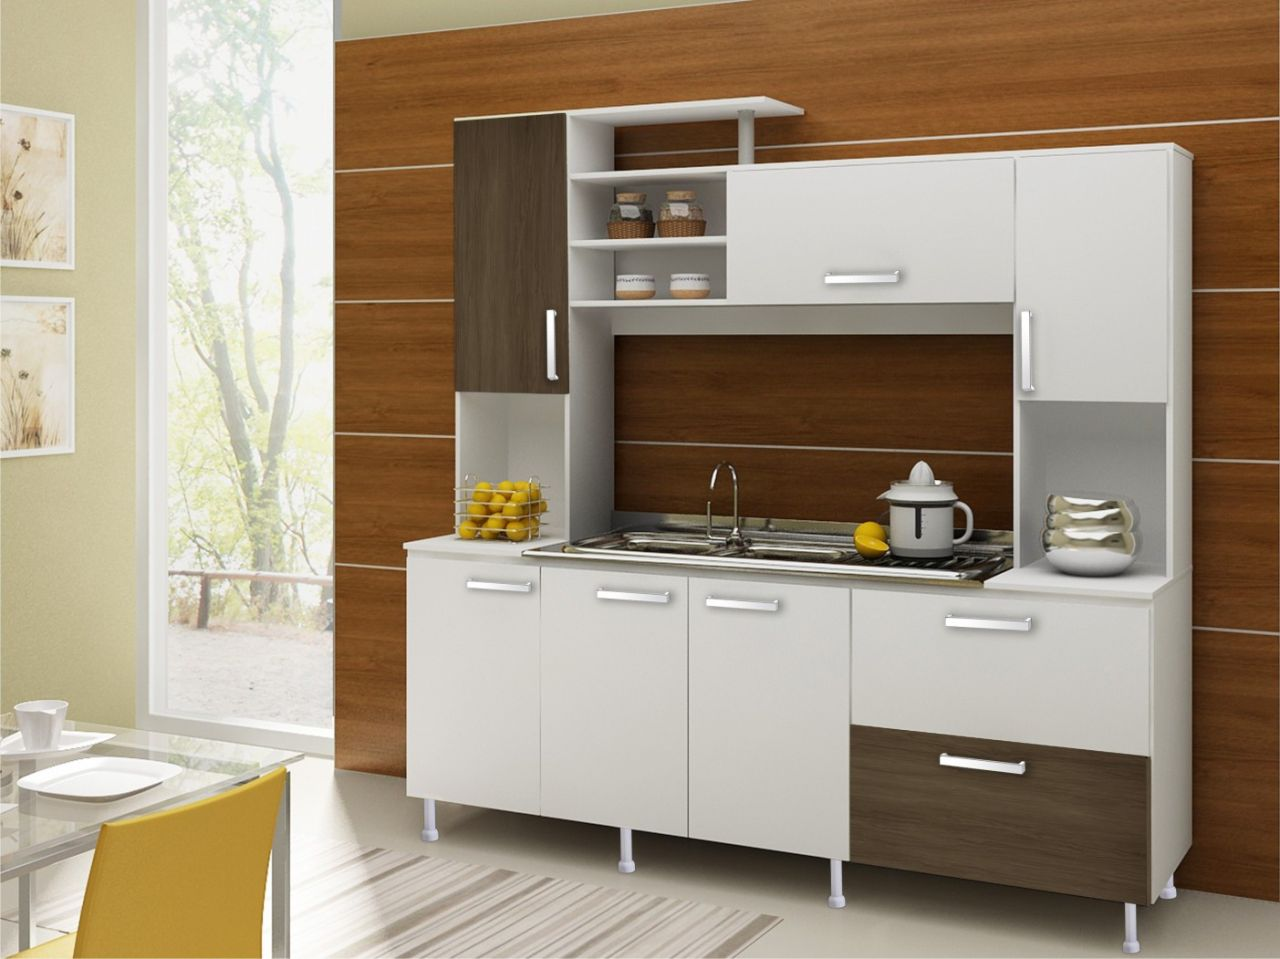 Móveis Kalinoski # Cozinha Compacta Moveis Sul